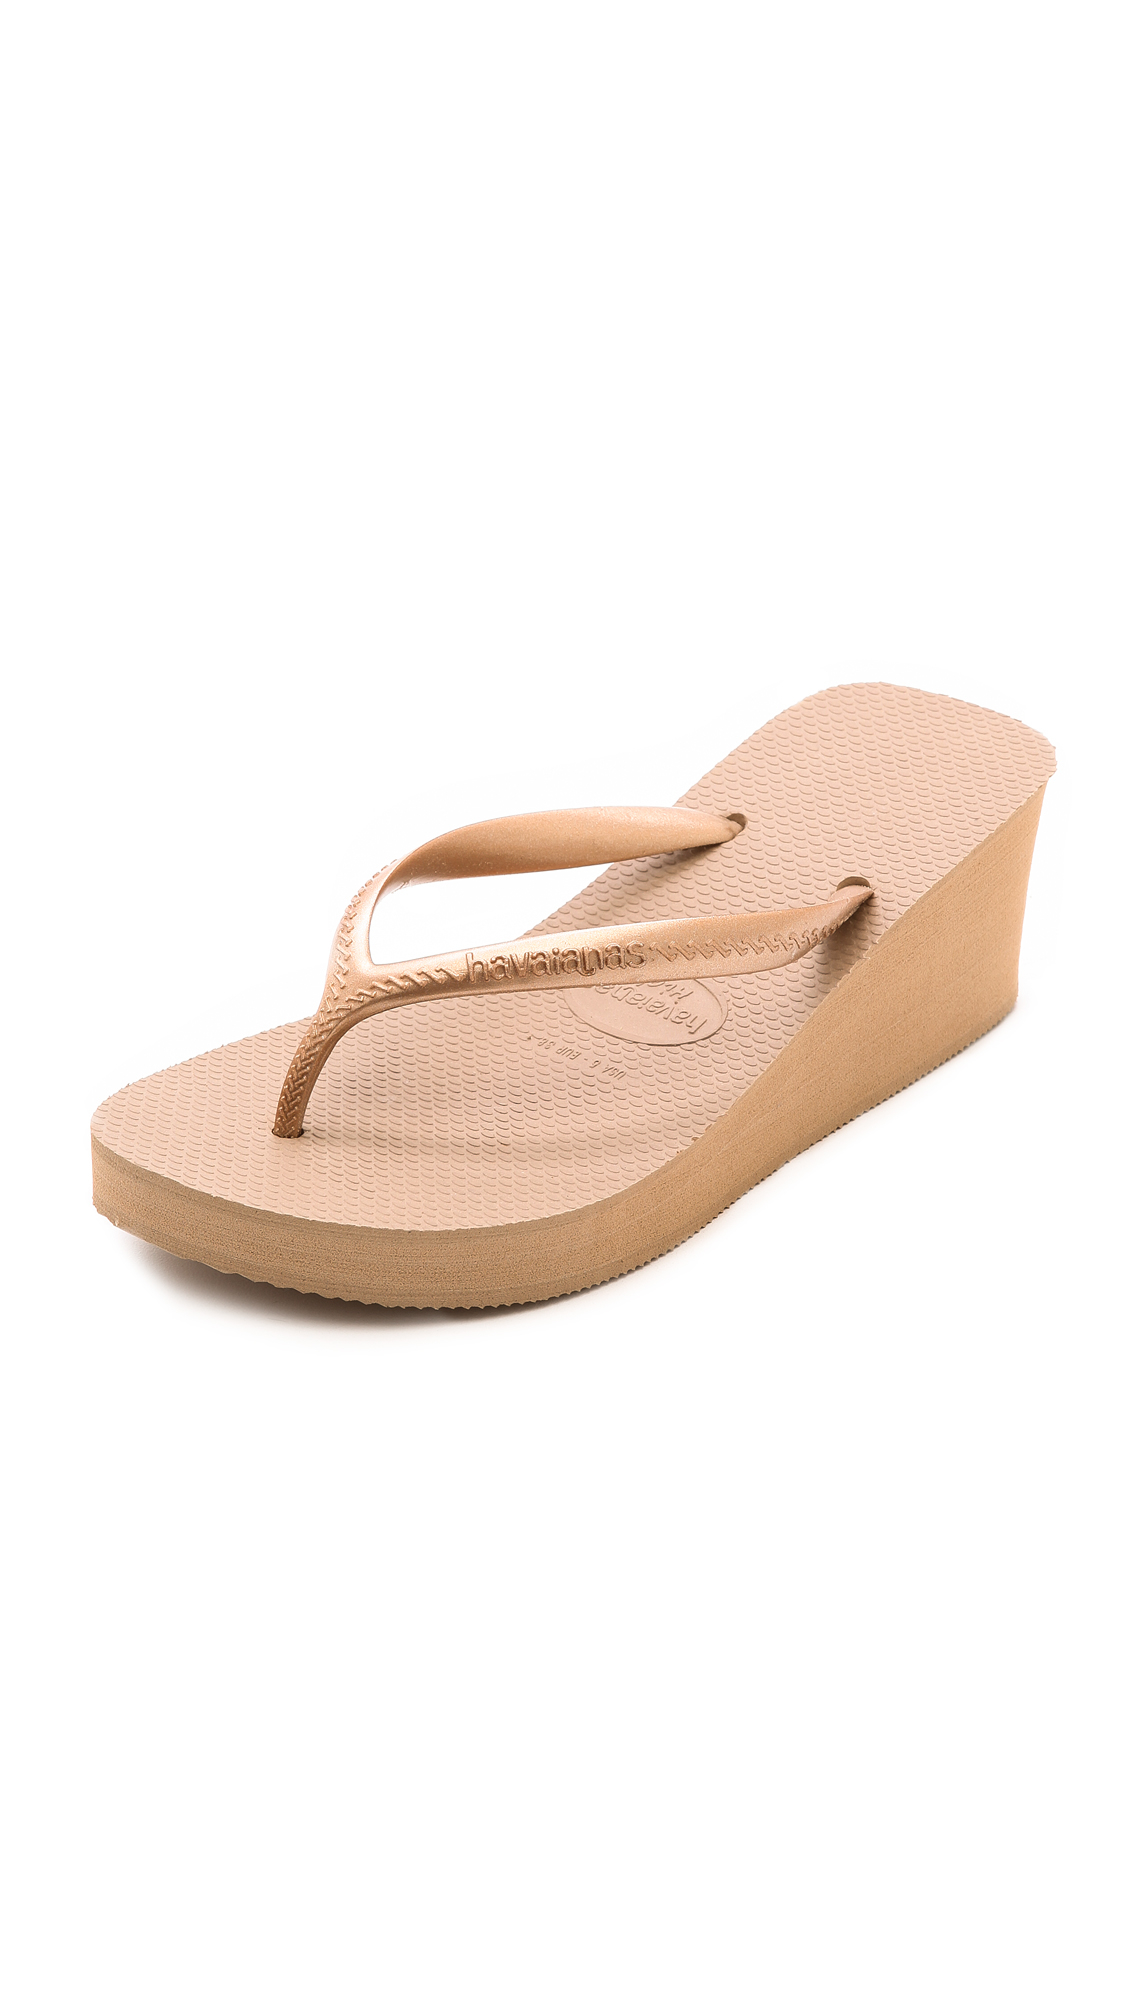 6171f9582 Lyst - Havaianas High Fashion Wedge Flip Flops in Pink